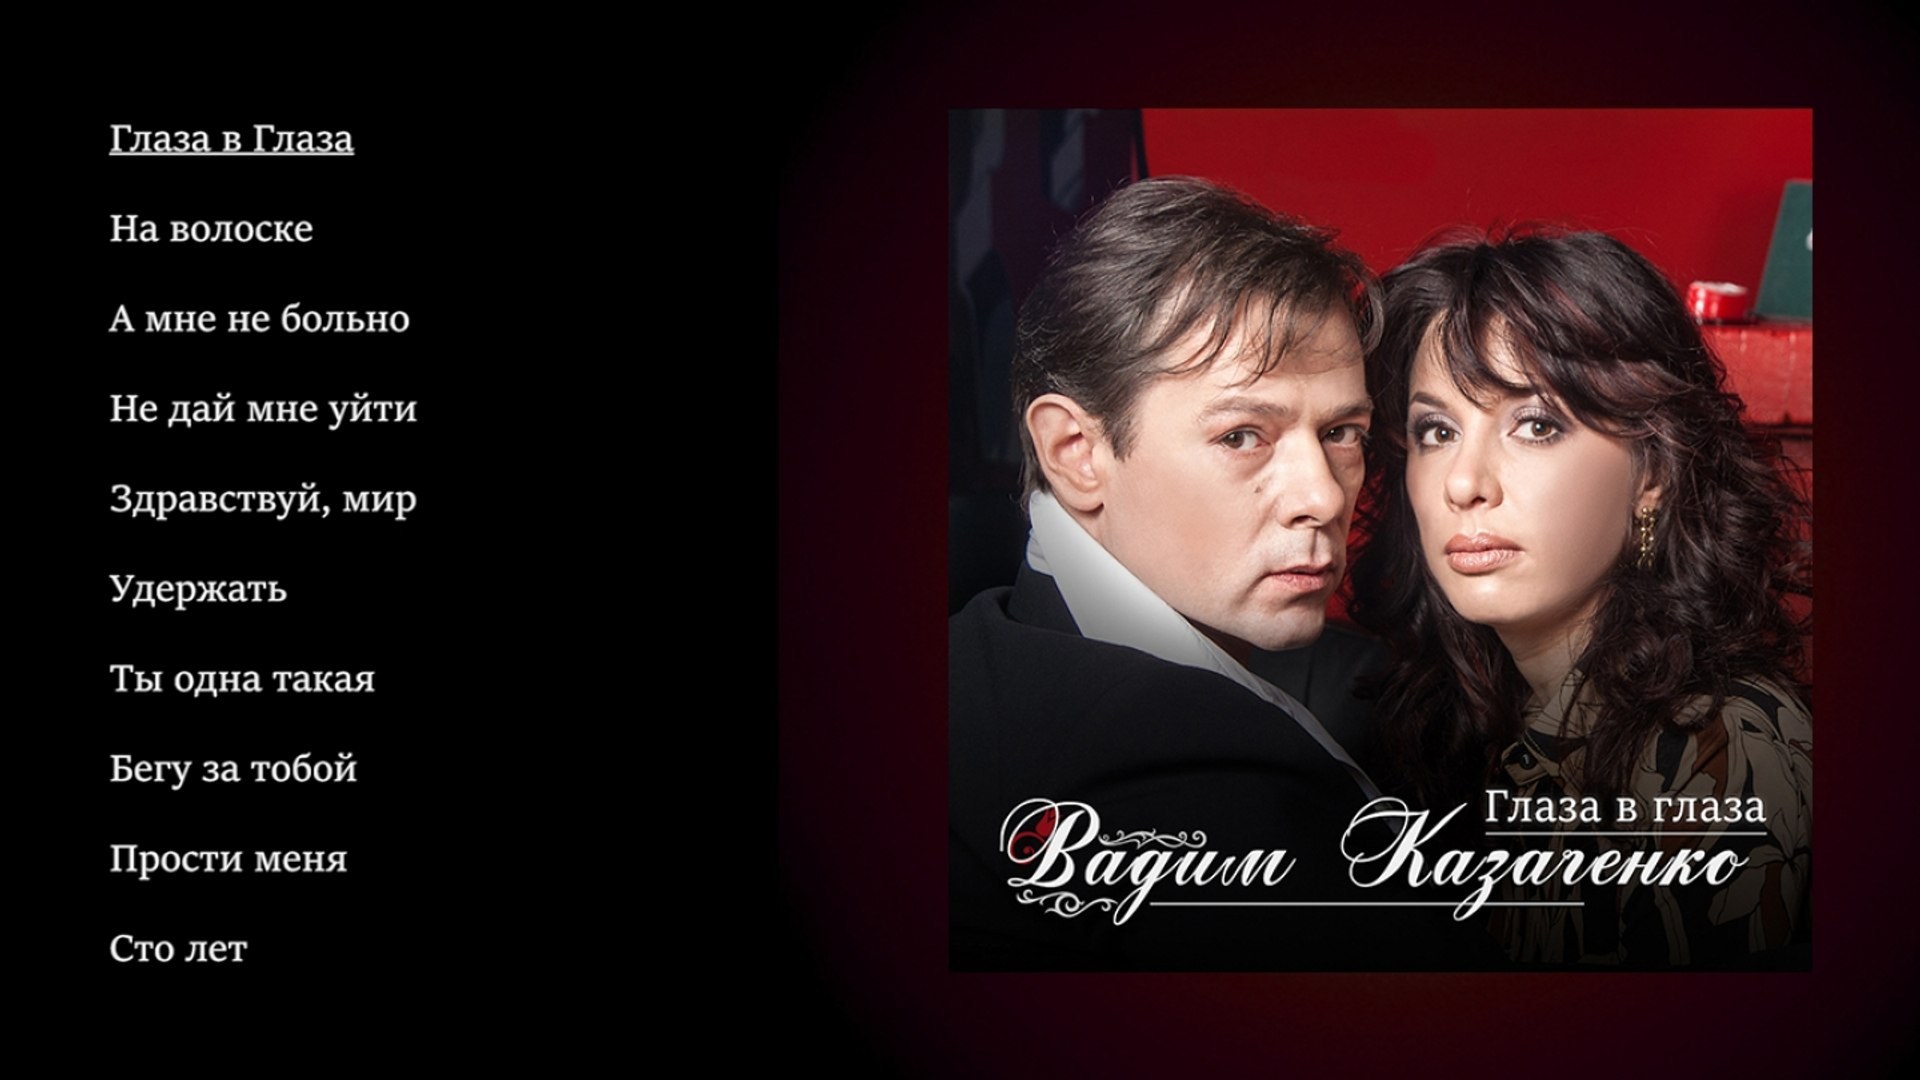 Вадим Казаченко - Глаза в Глаза (official audio album)